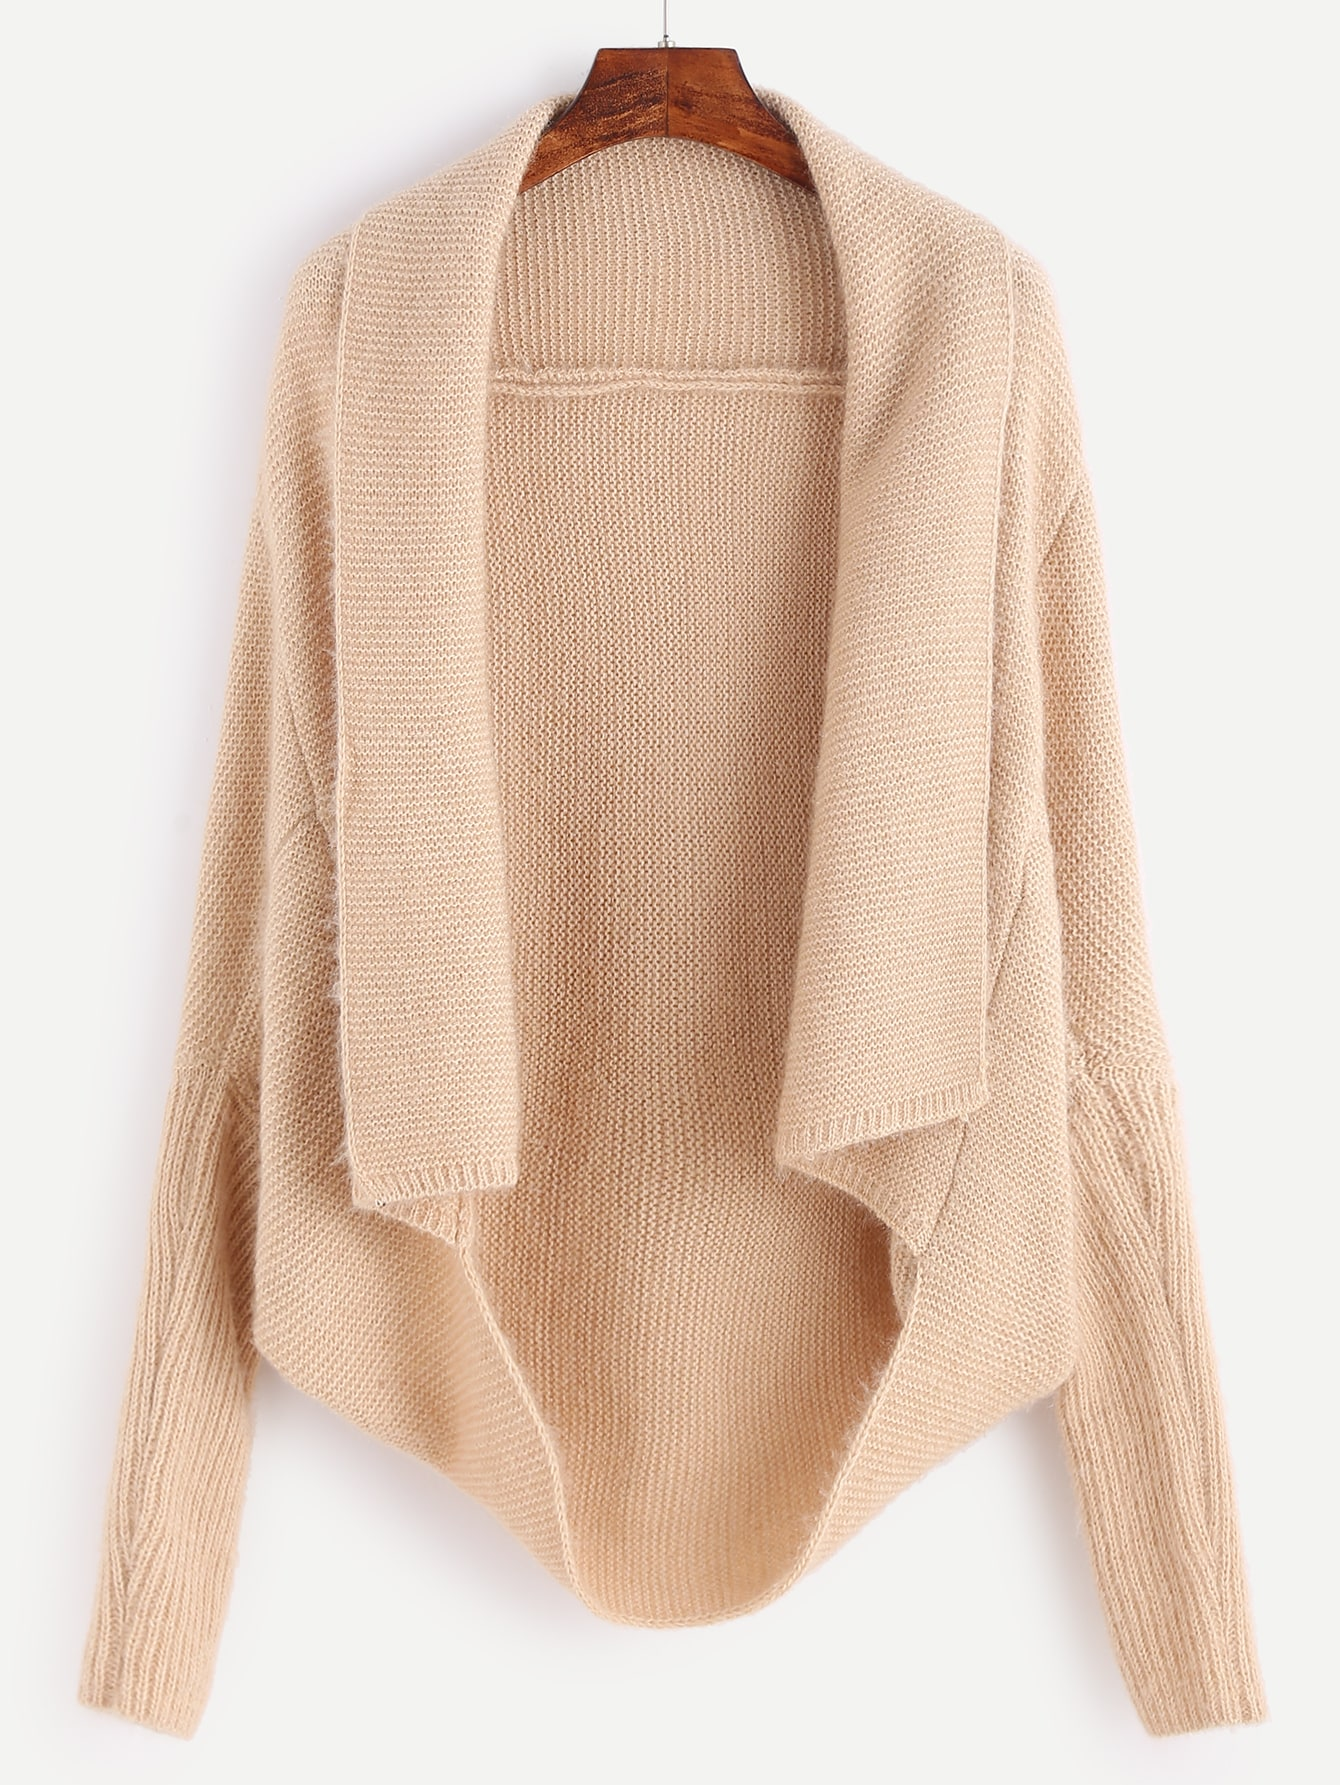 sweater161013303_2